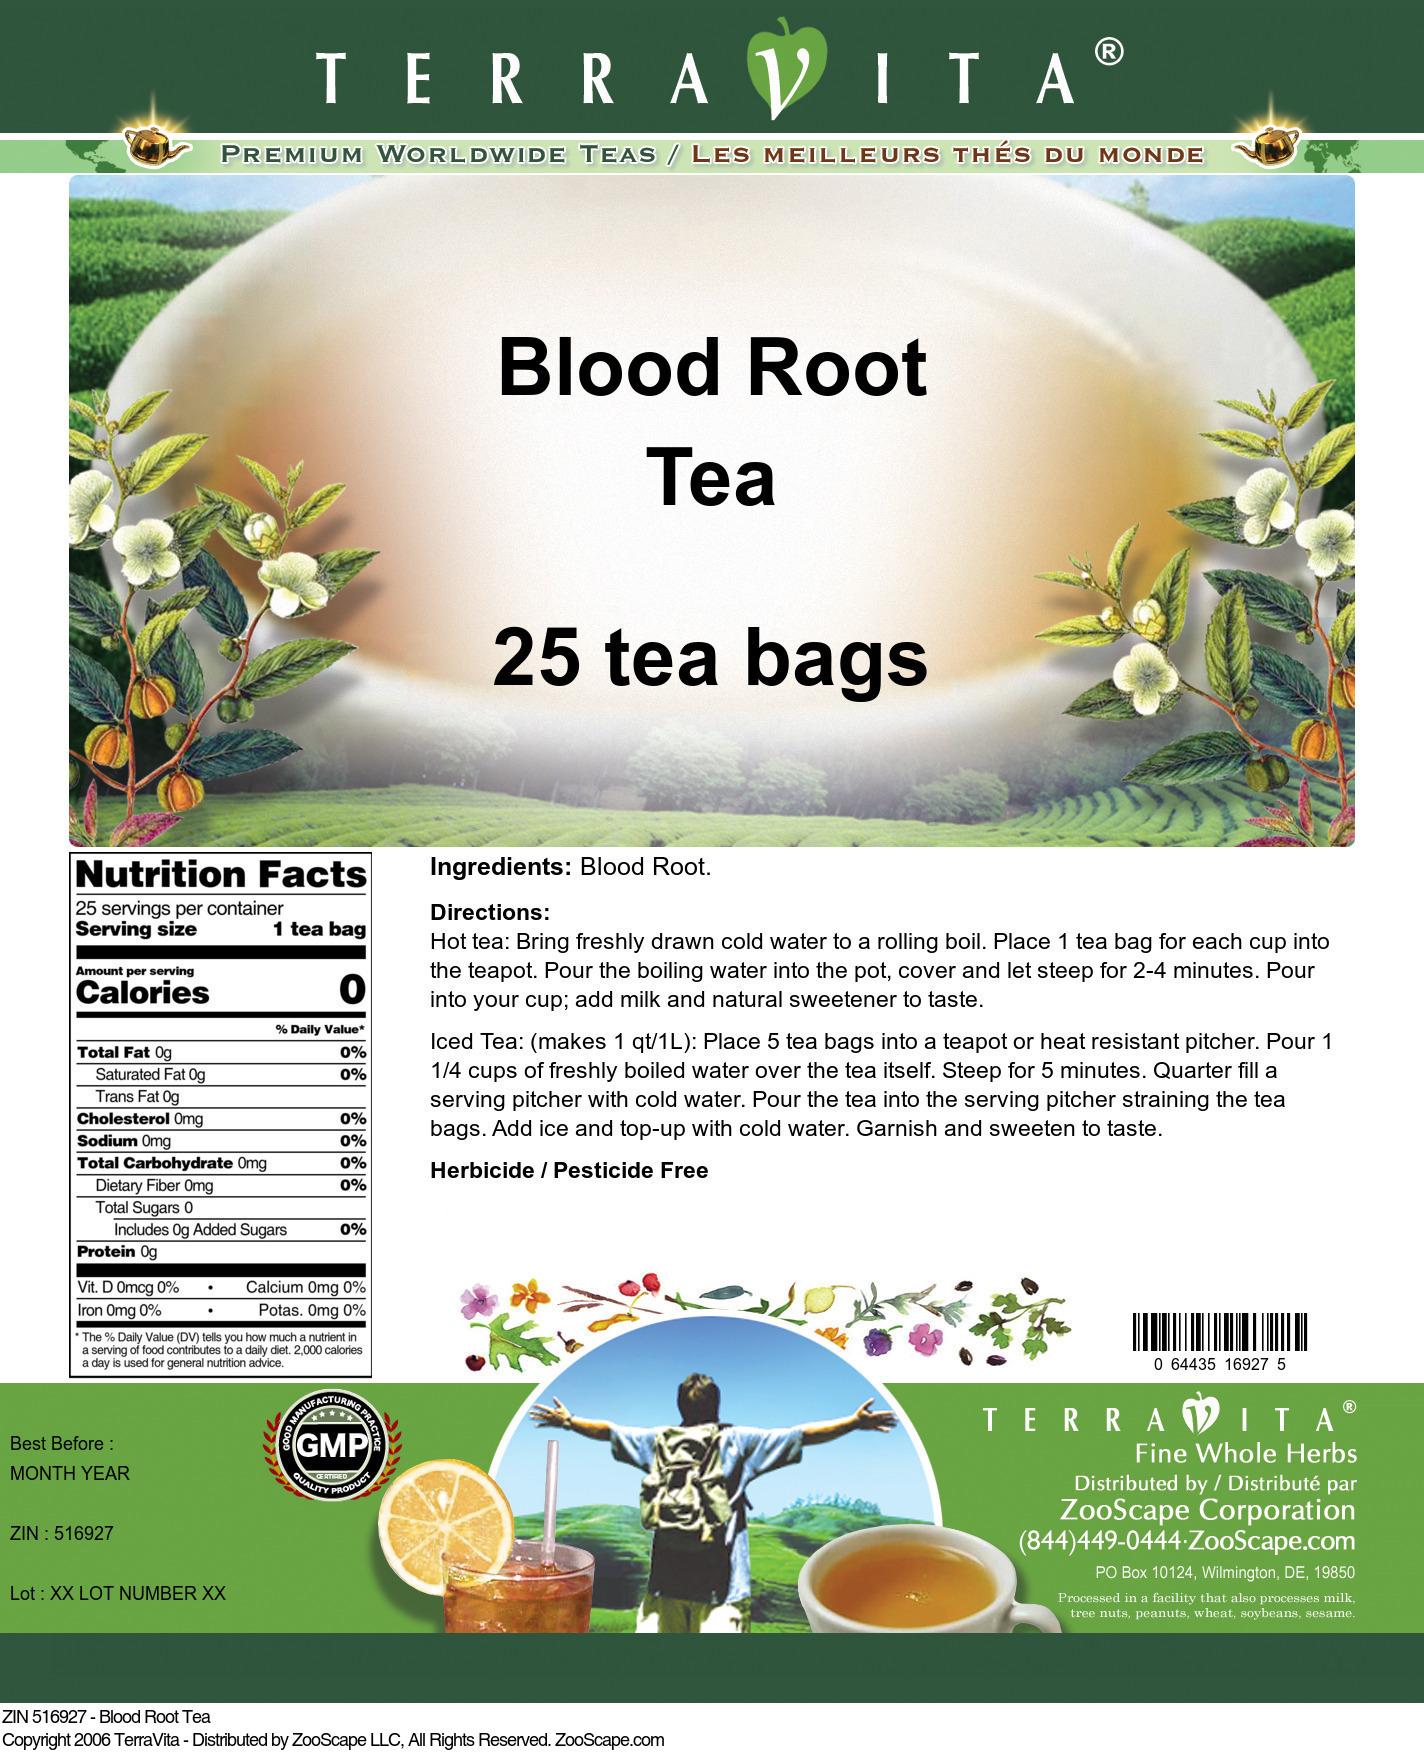 Blood Root Tea